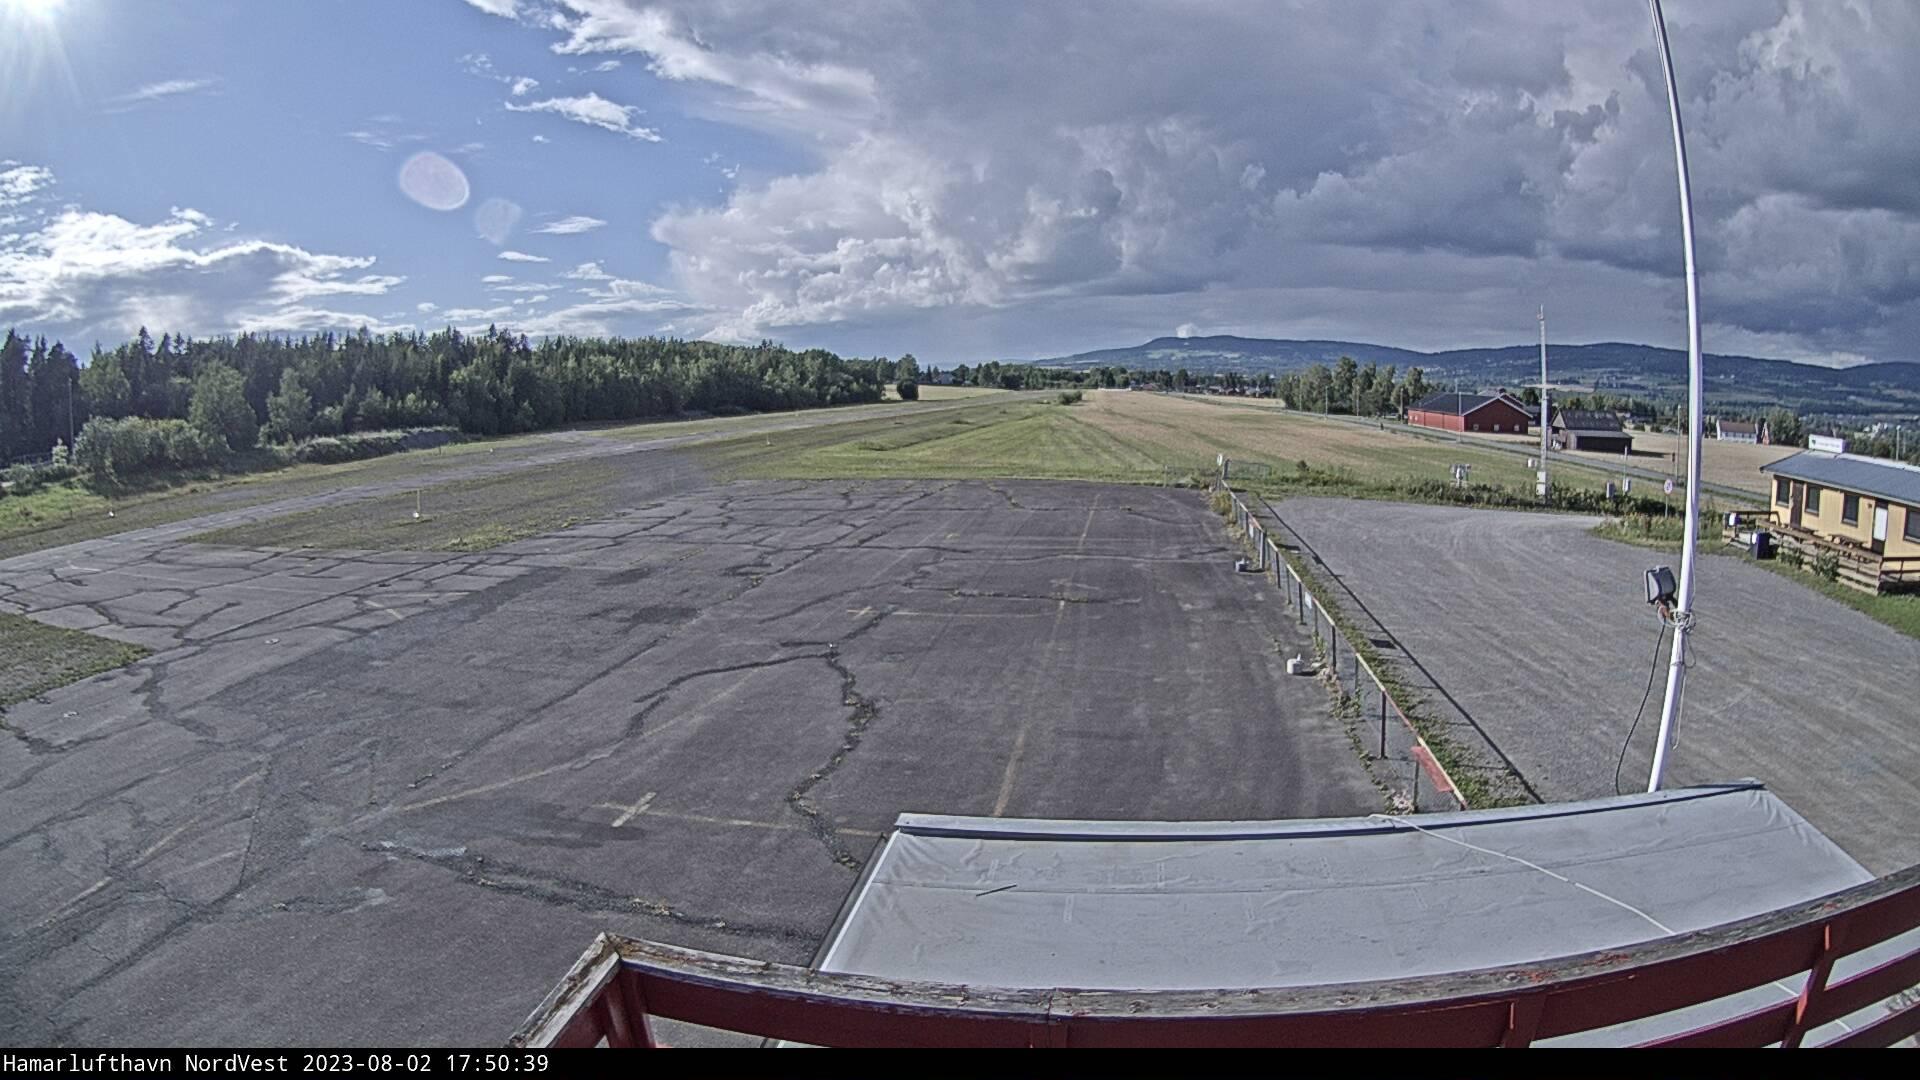 Hamar - Hamar Lufthavn; mot nordvest